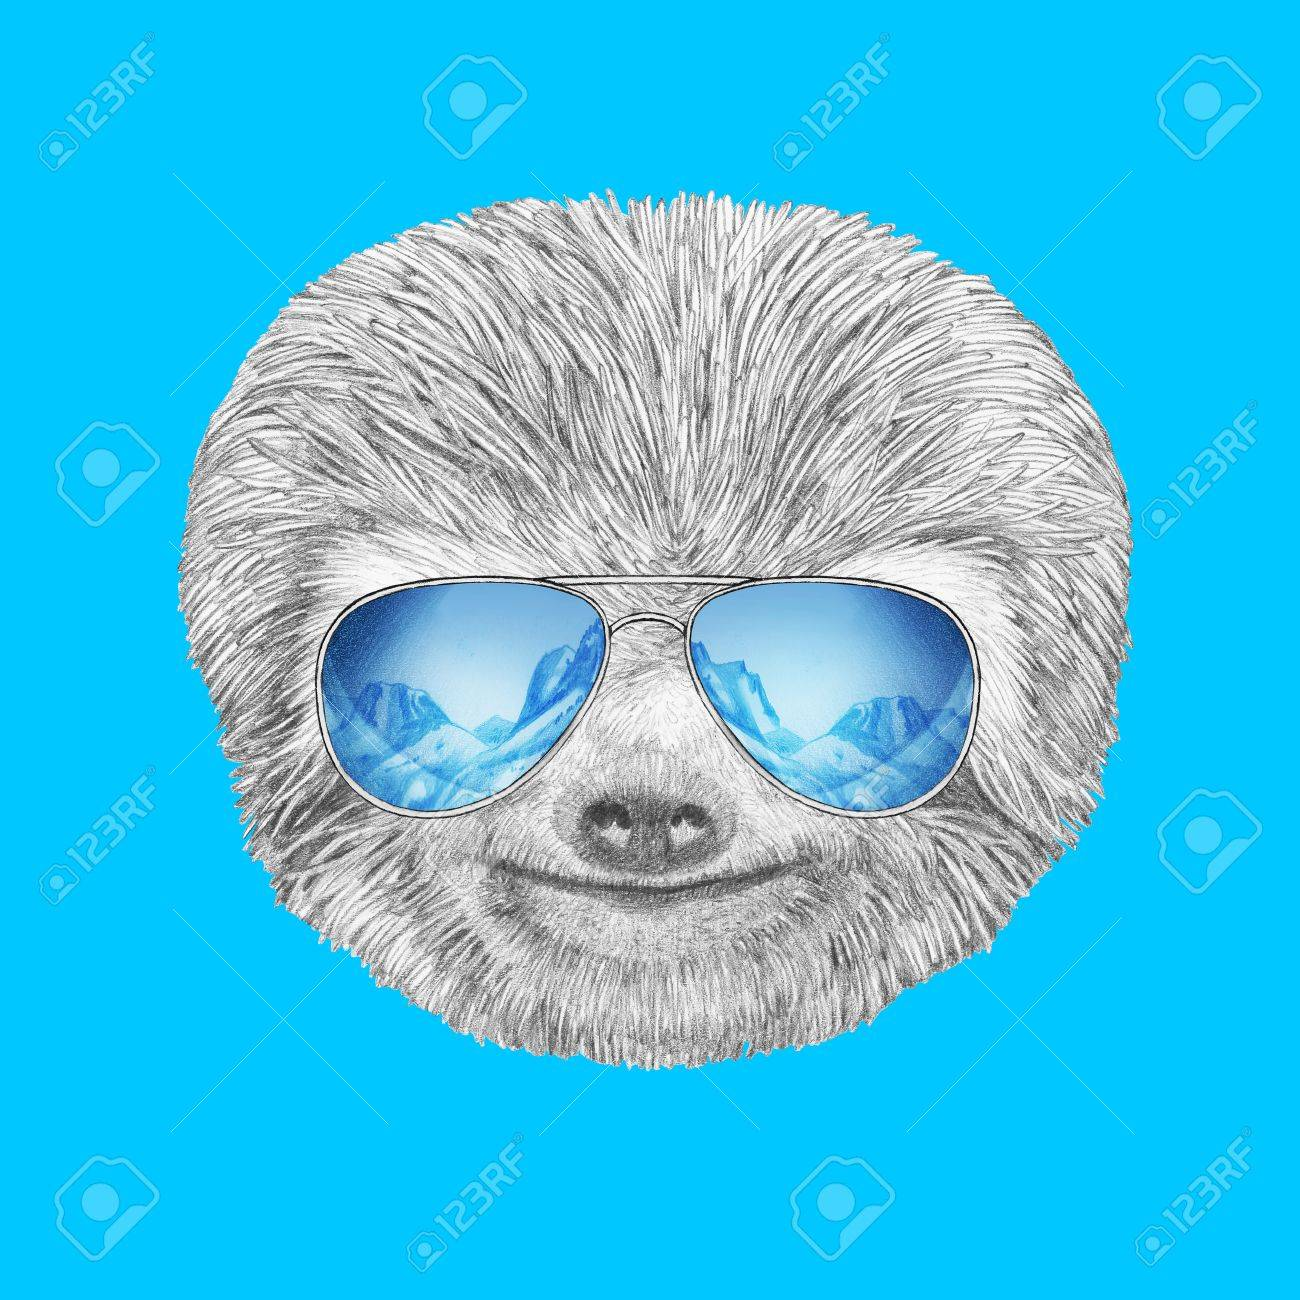 portrait of sloth with mirror sunglasses hand drawn illustration